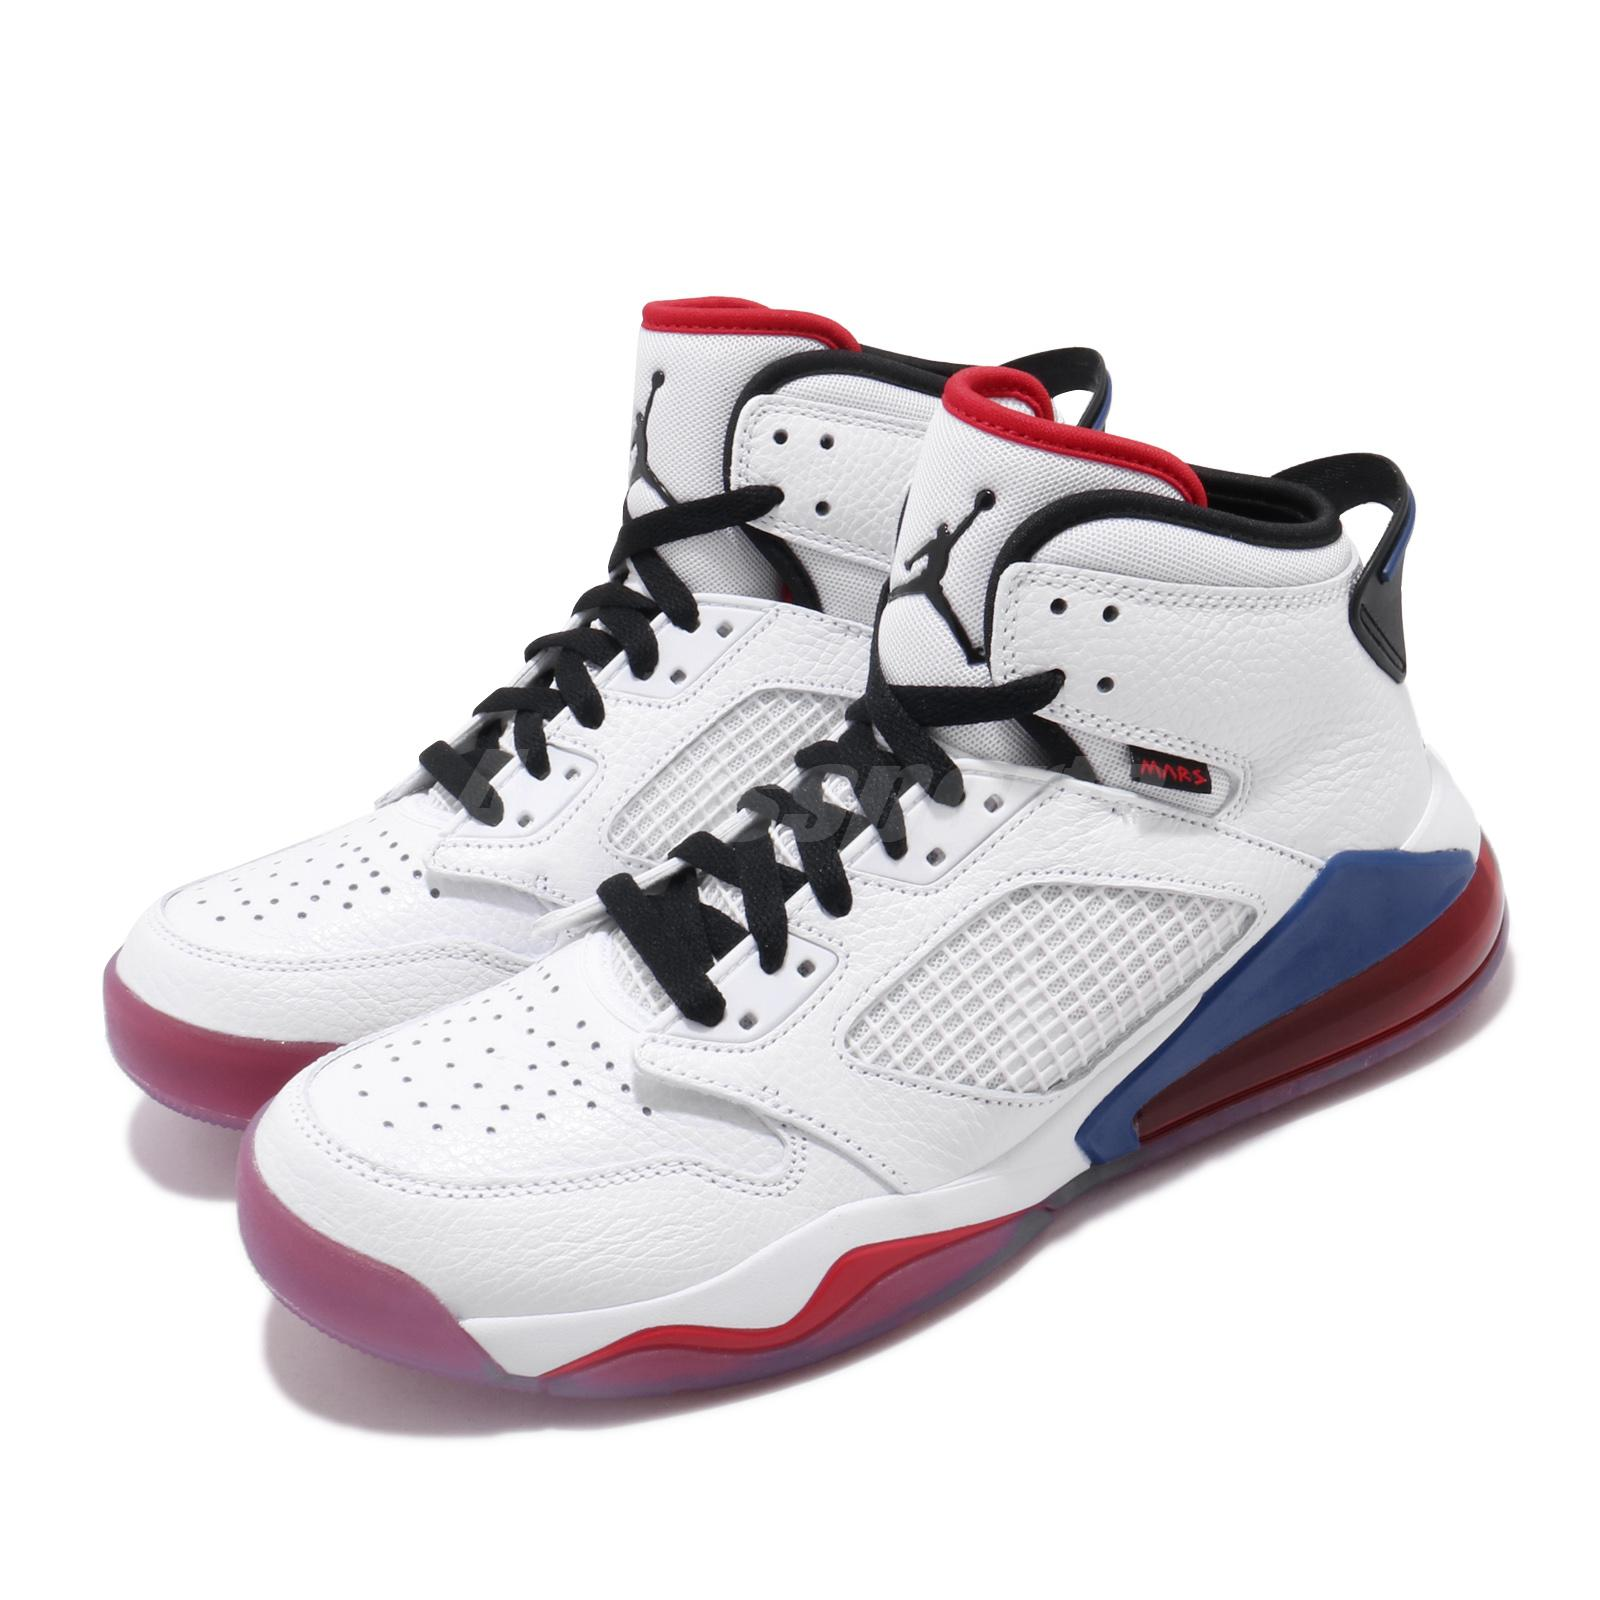 Nike Jordan Mars 270 White Black Red Blue Air Max Men Basketball